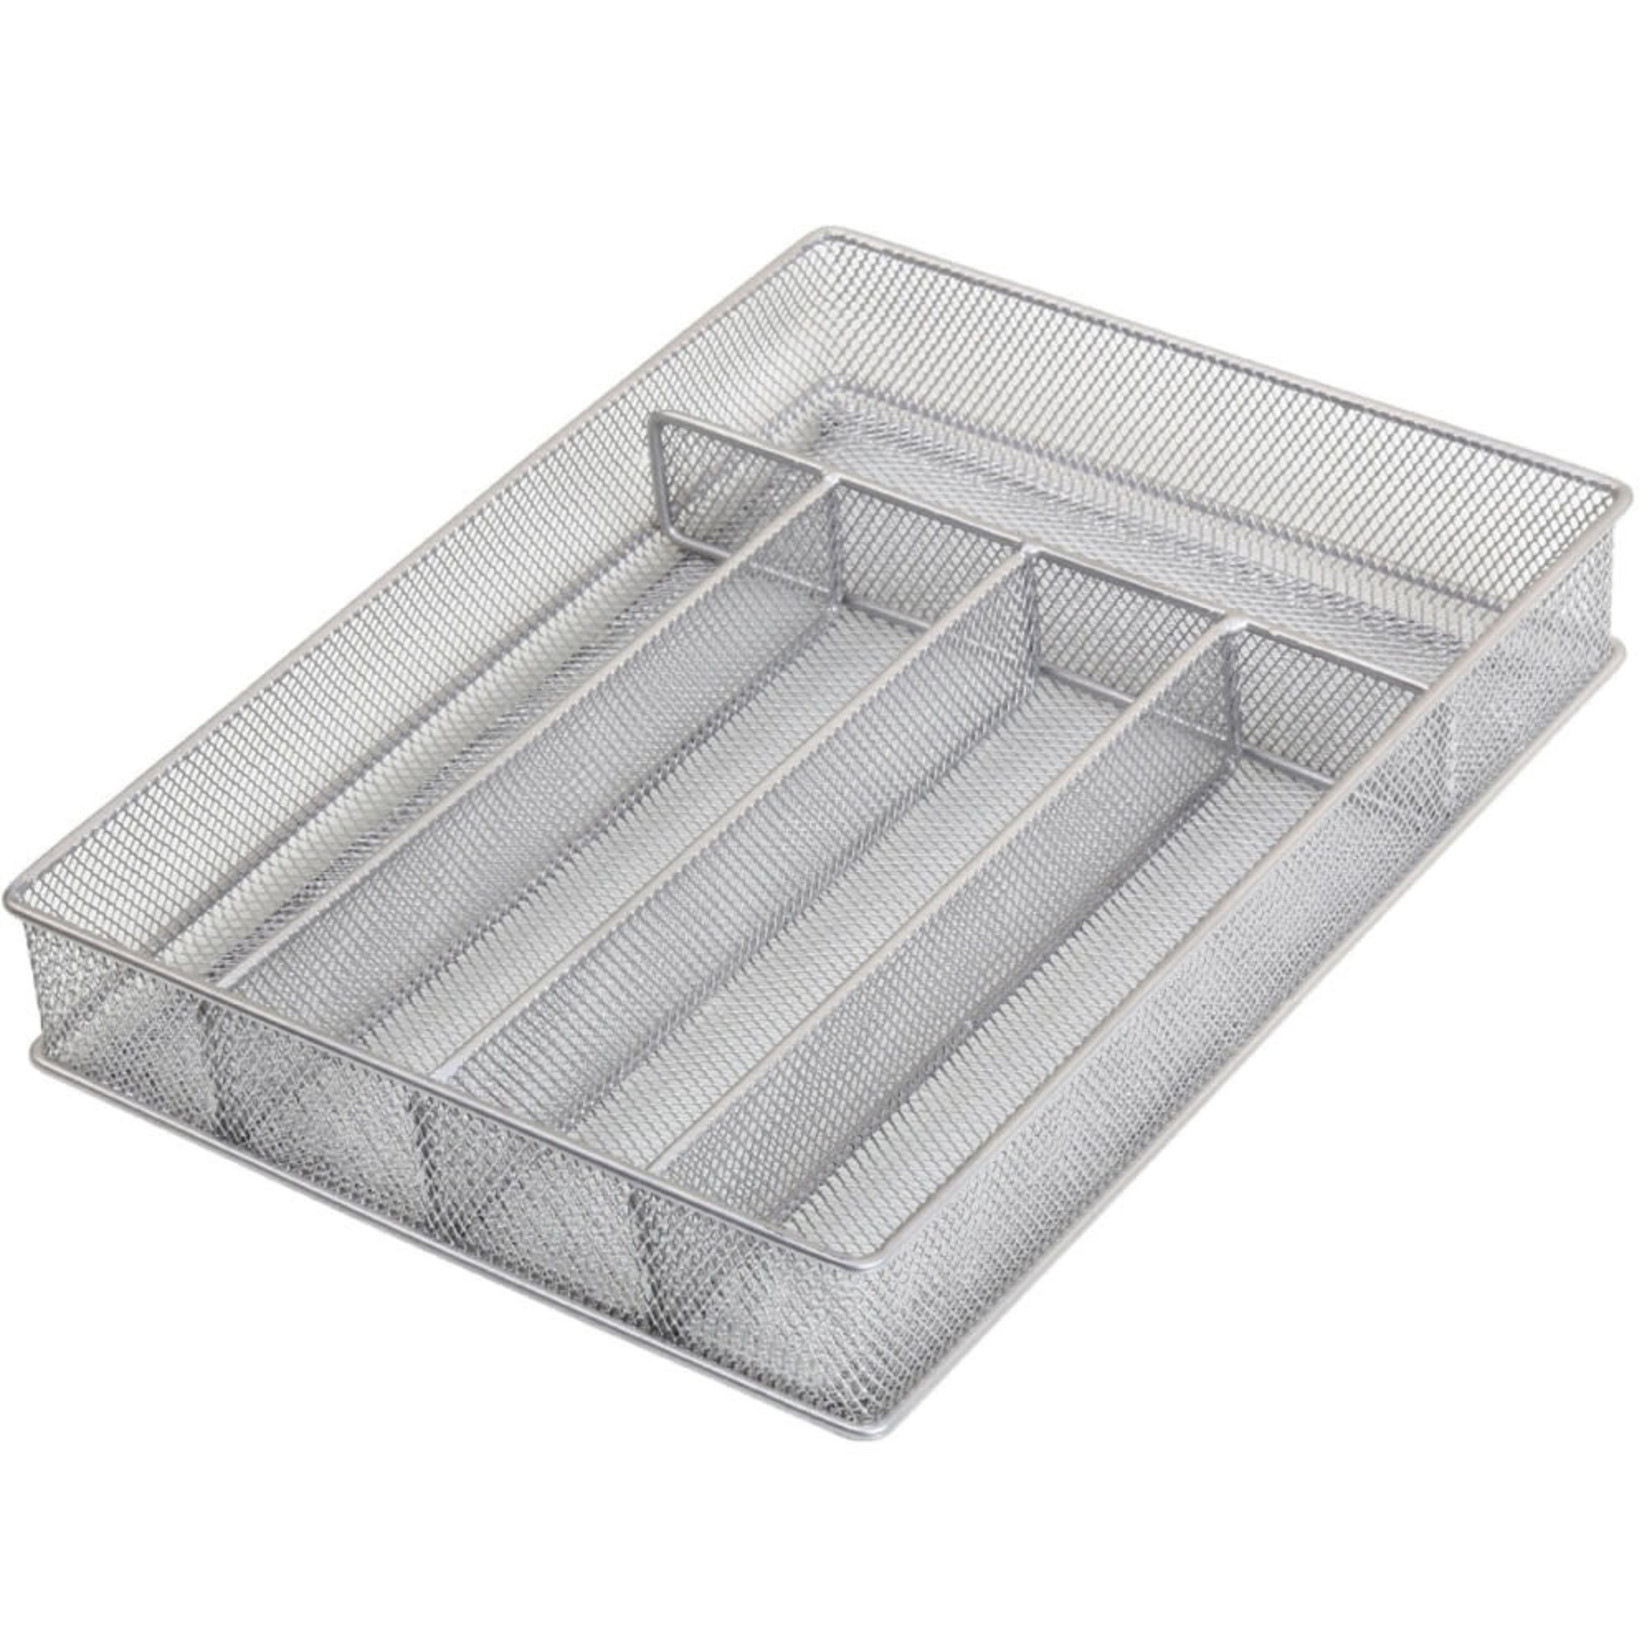 5-part In-drawer Organizer/tray Mesh 1133